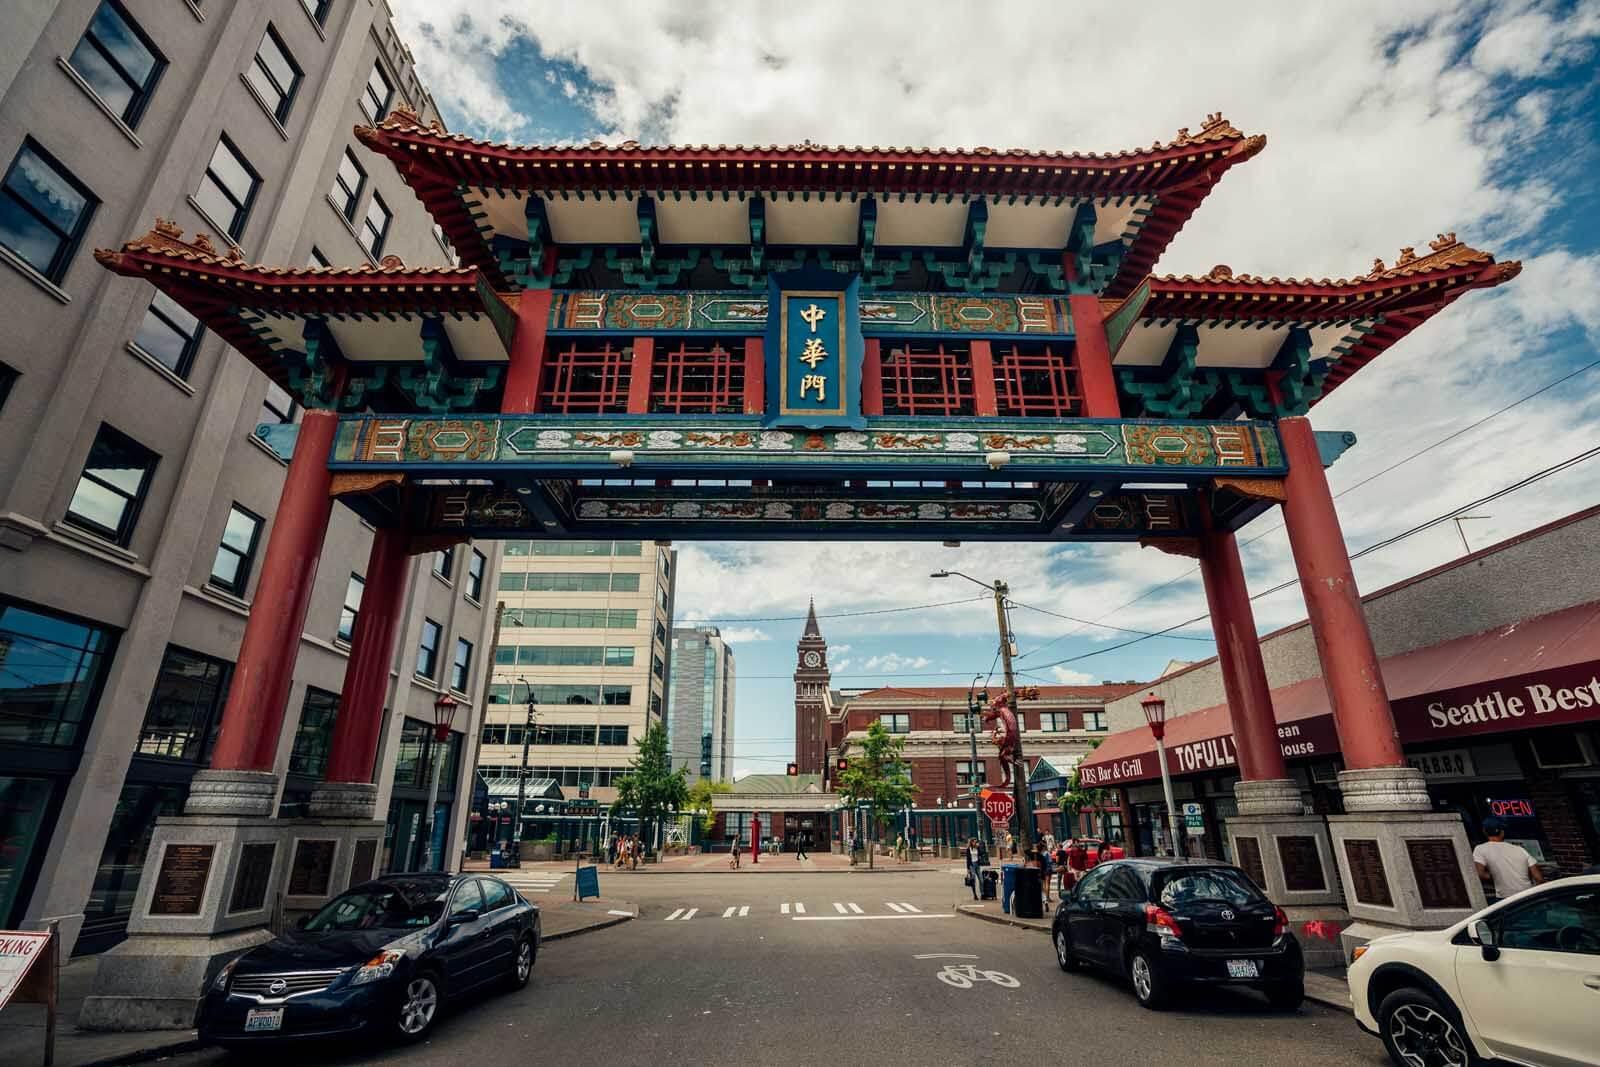 the gateway to Chinatown neighborhood in Seattle Washington